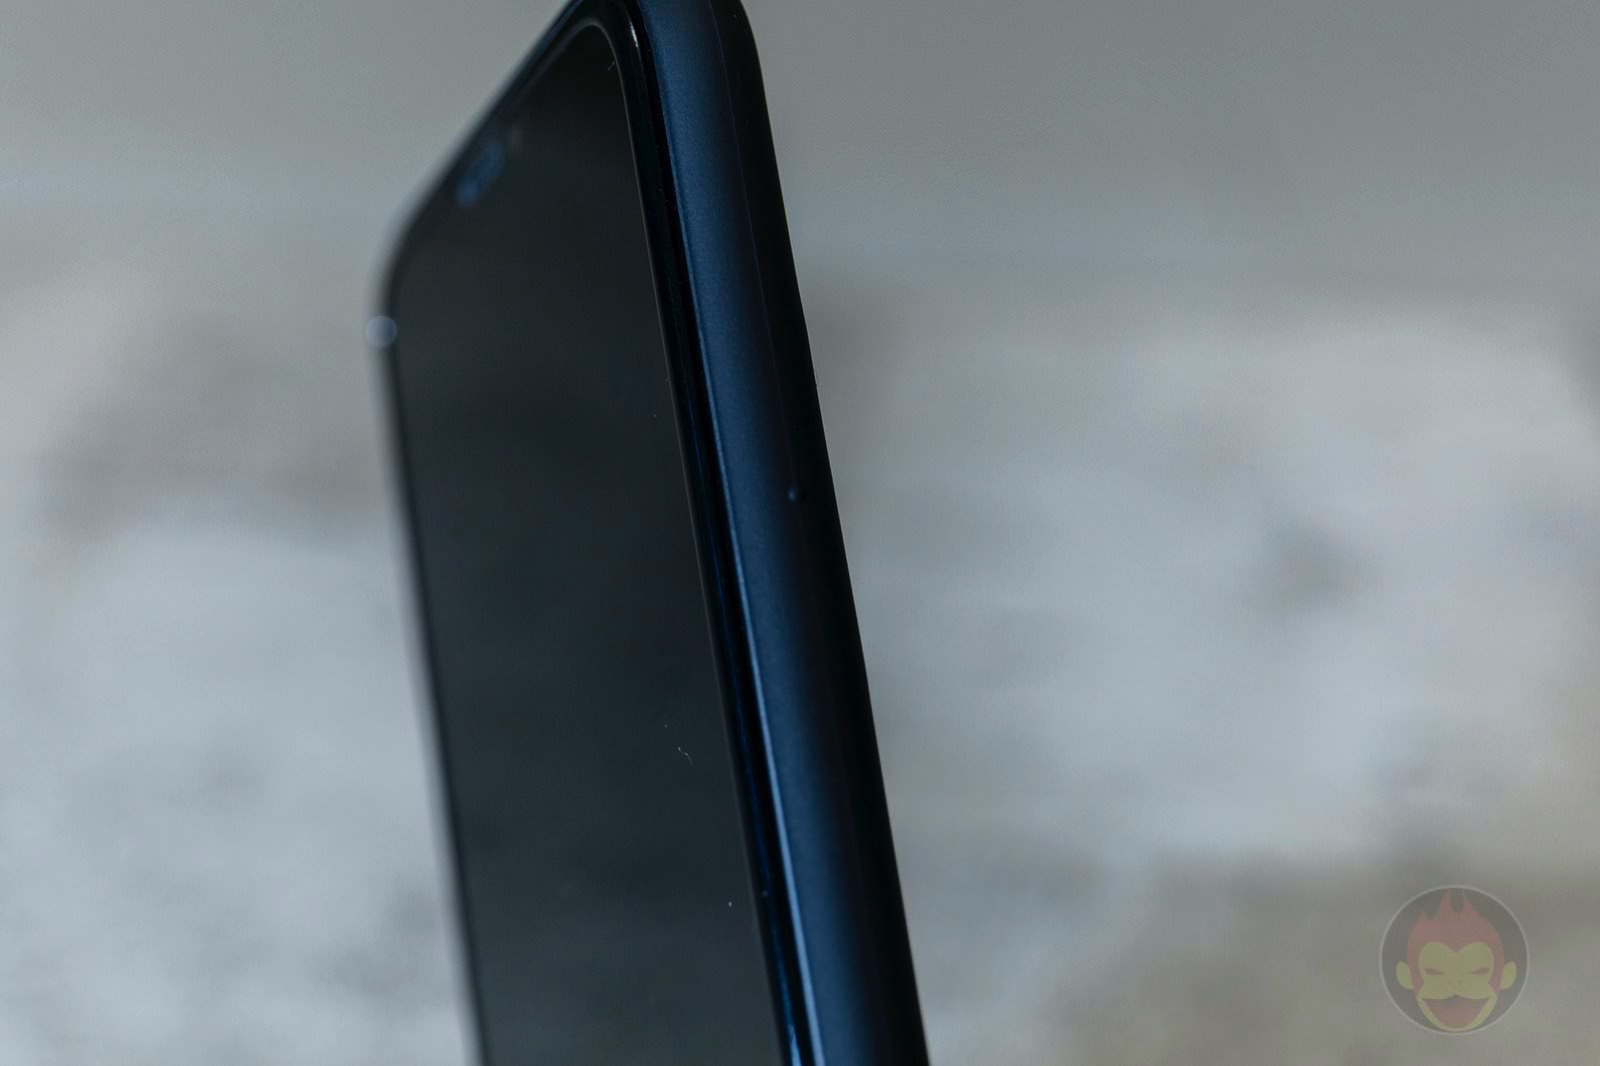 MYNUS-iPhone-XS-Case-Review-02.jpg